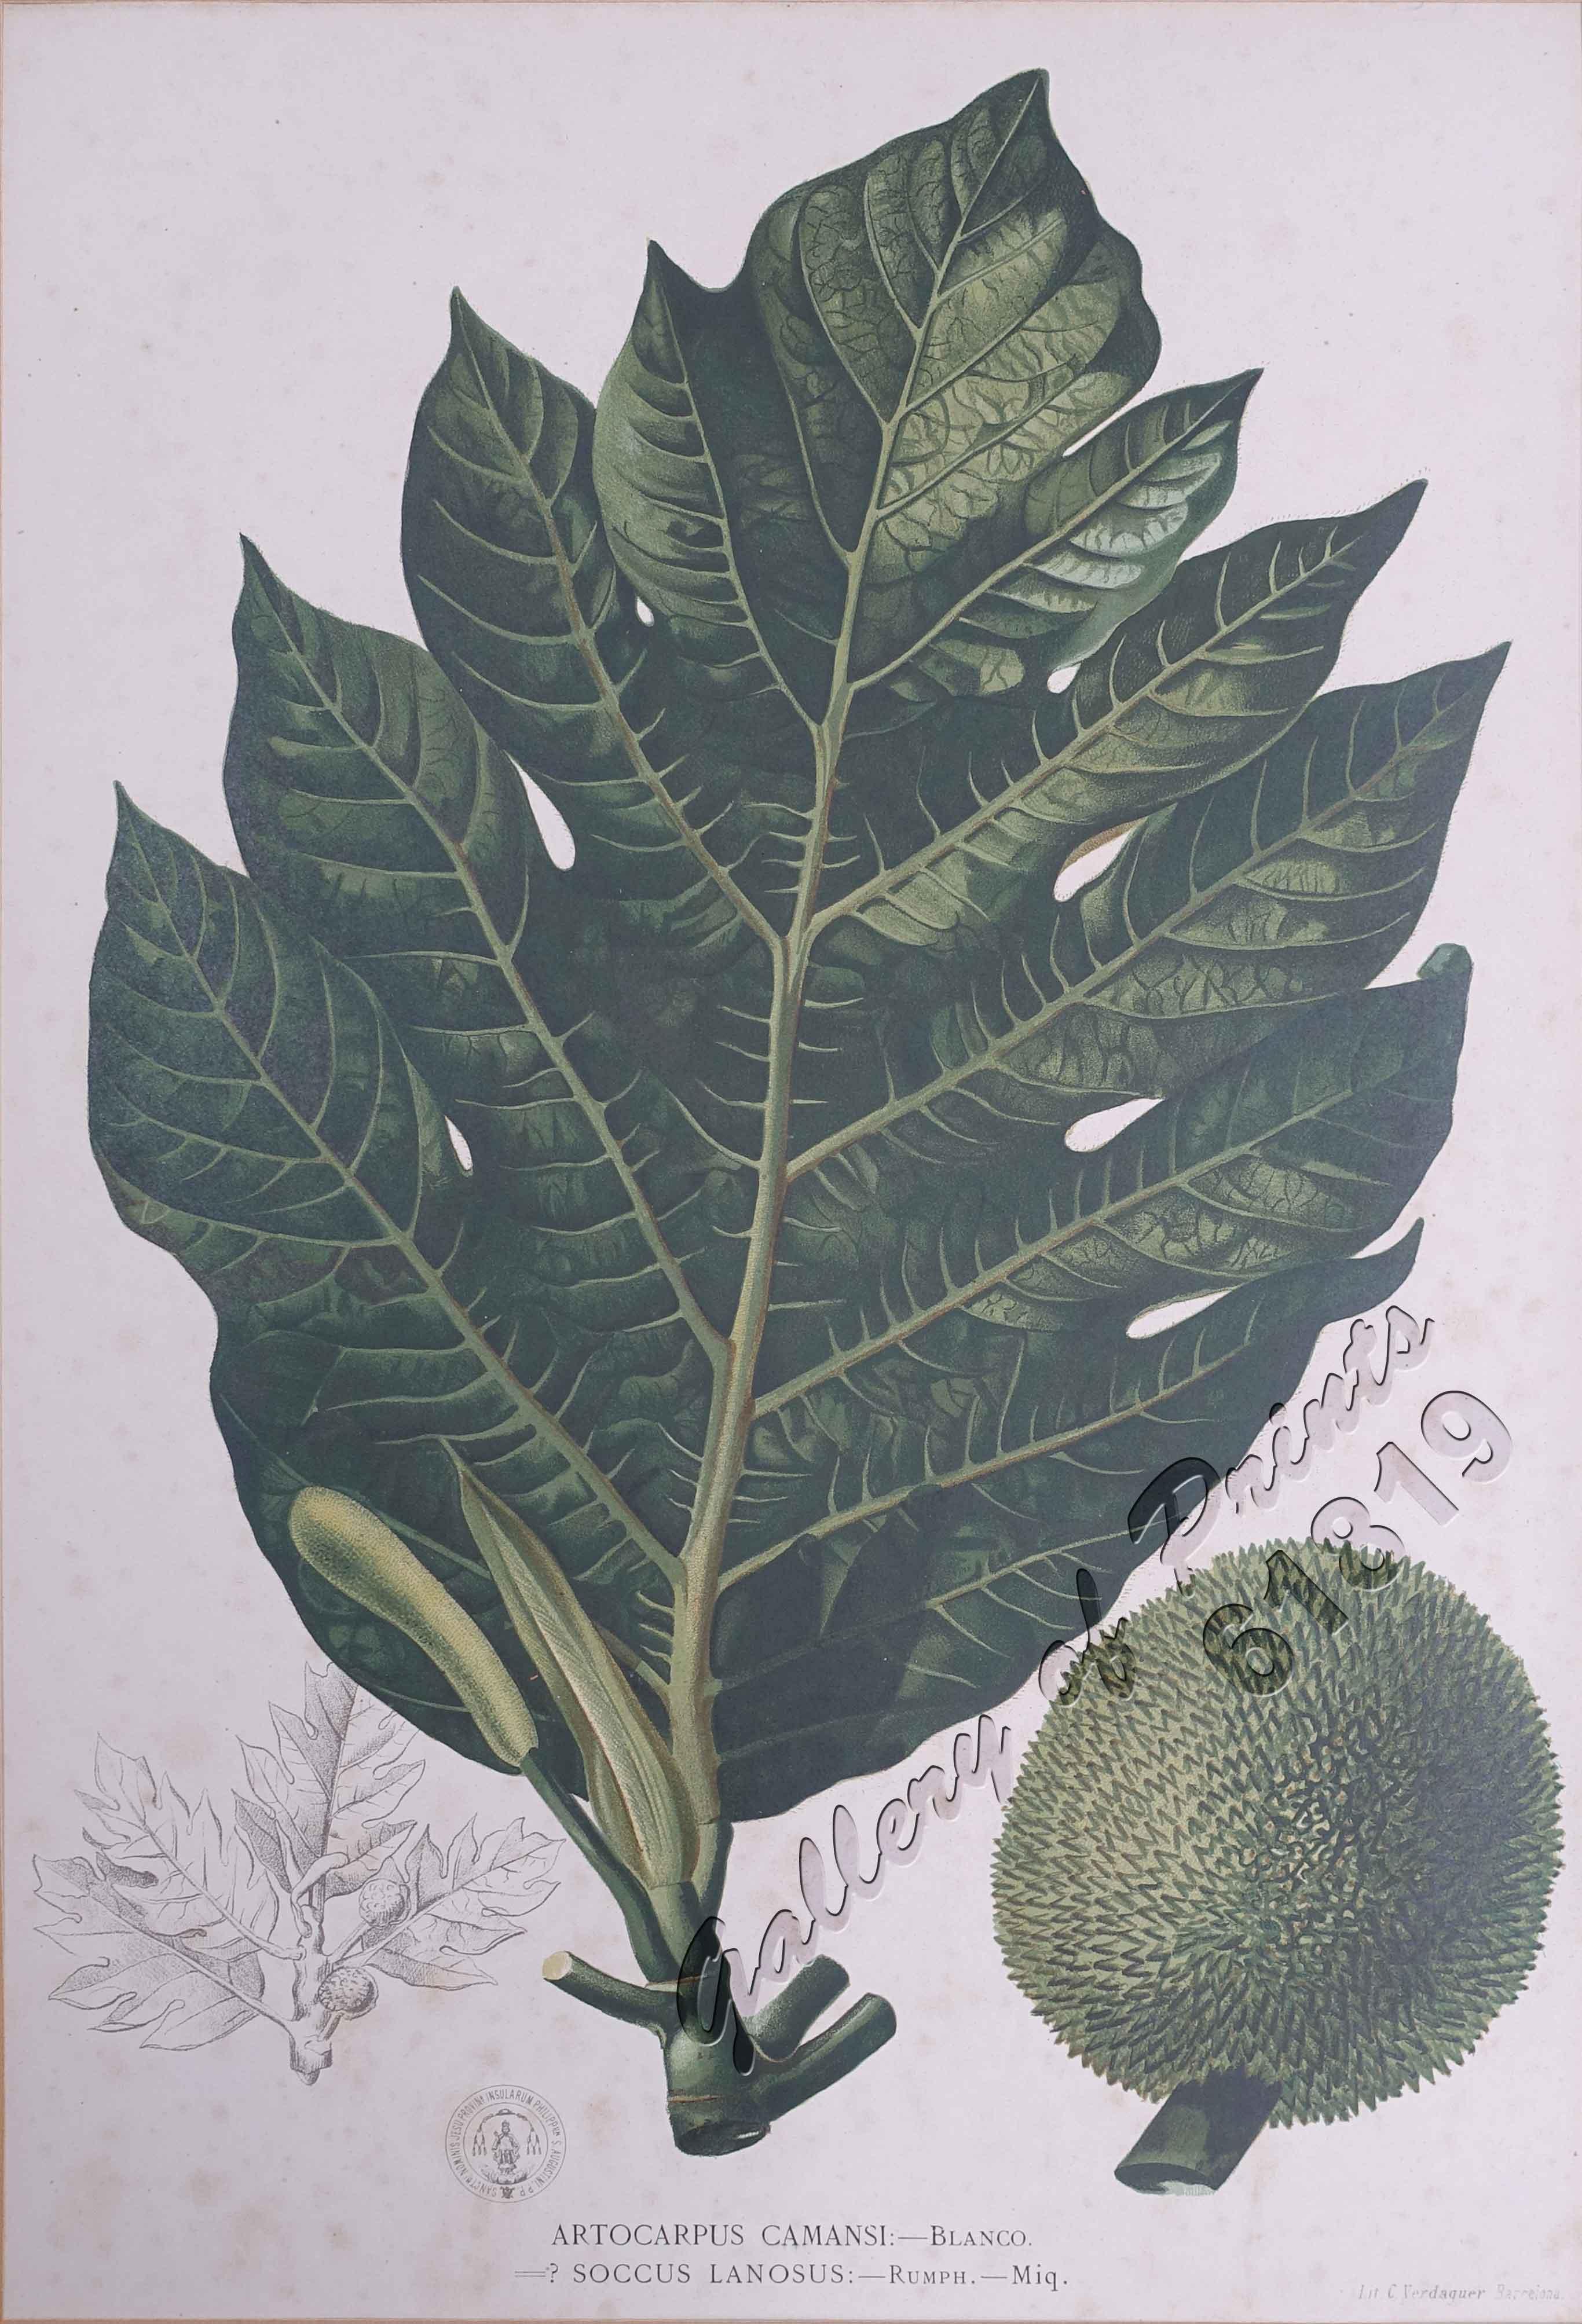 Artocarpus Camansi: - Blanco  Soccus Lanosus: - Rumph  - Miq  [Local Name:  Breadnut / Jackfruit]